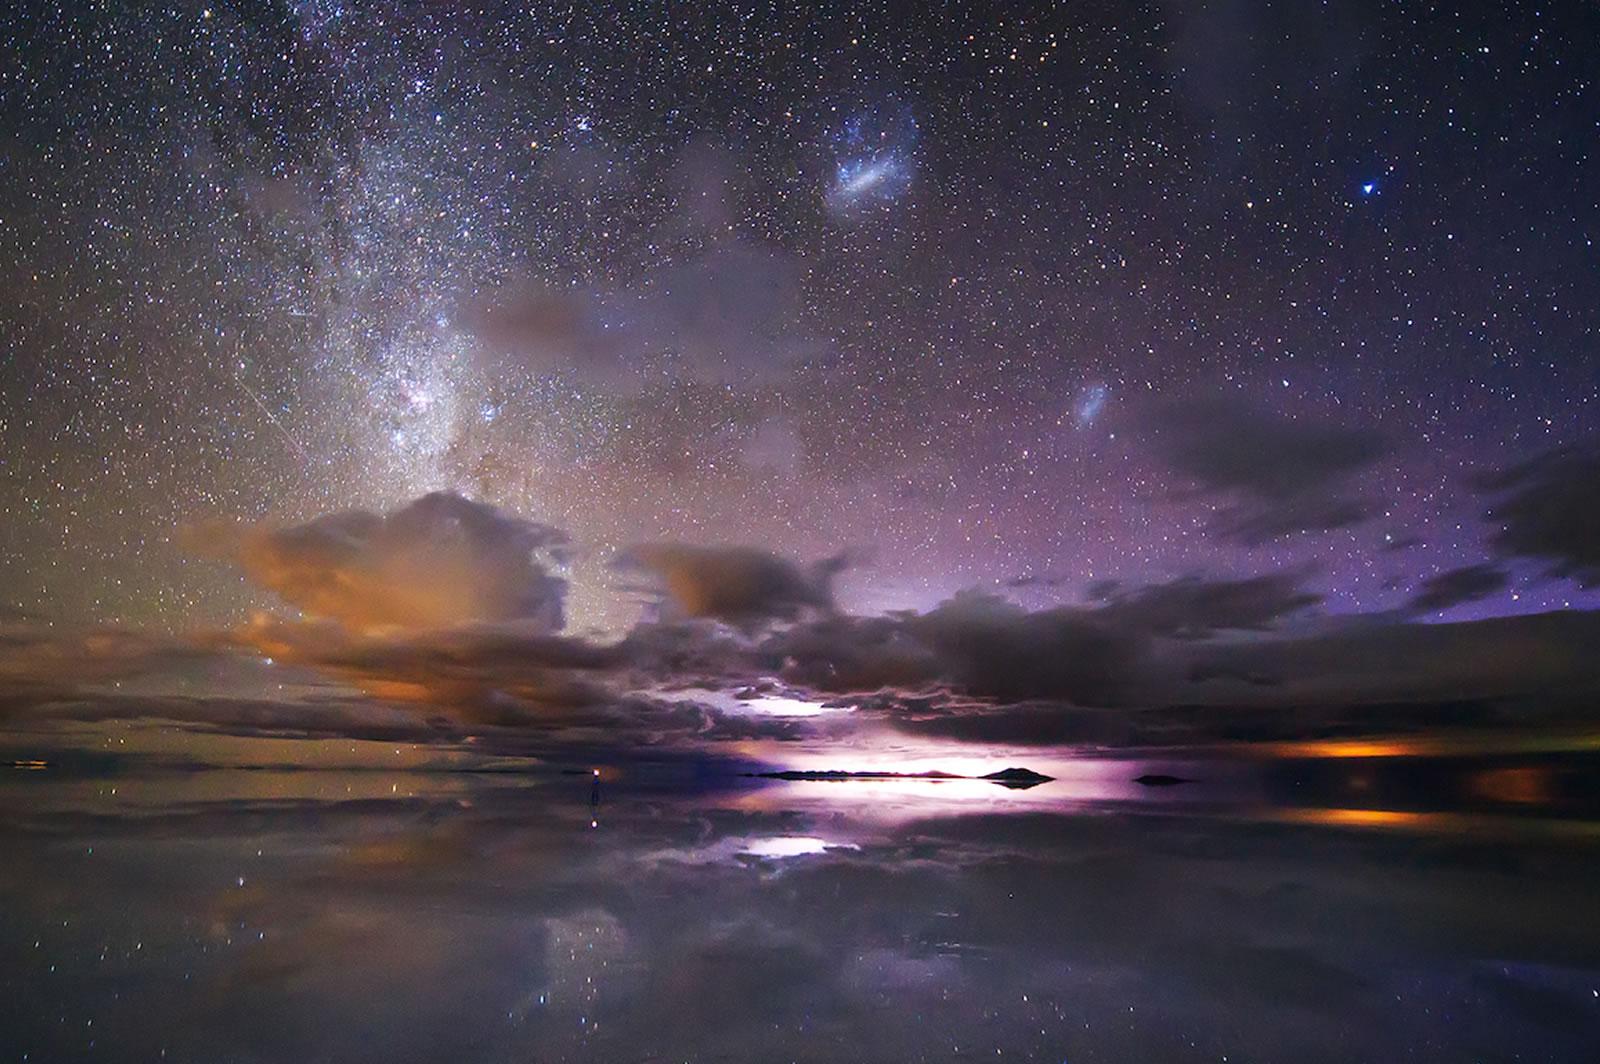 https://uyunisaltflat.com/Images/gallery/stargazing-17.jpg